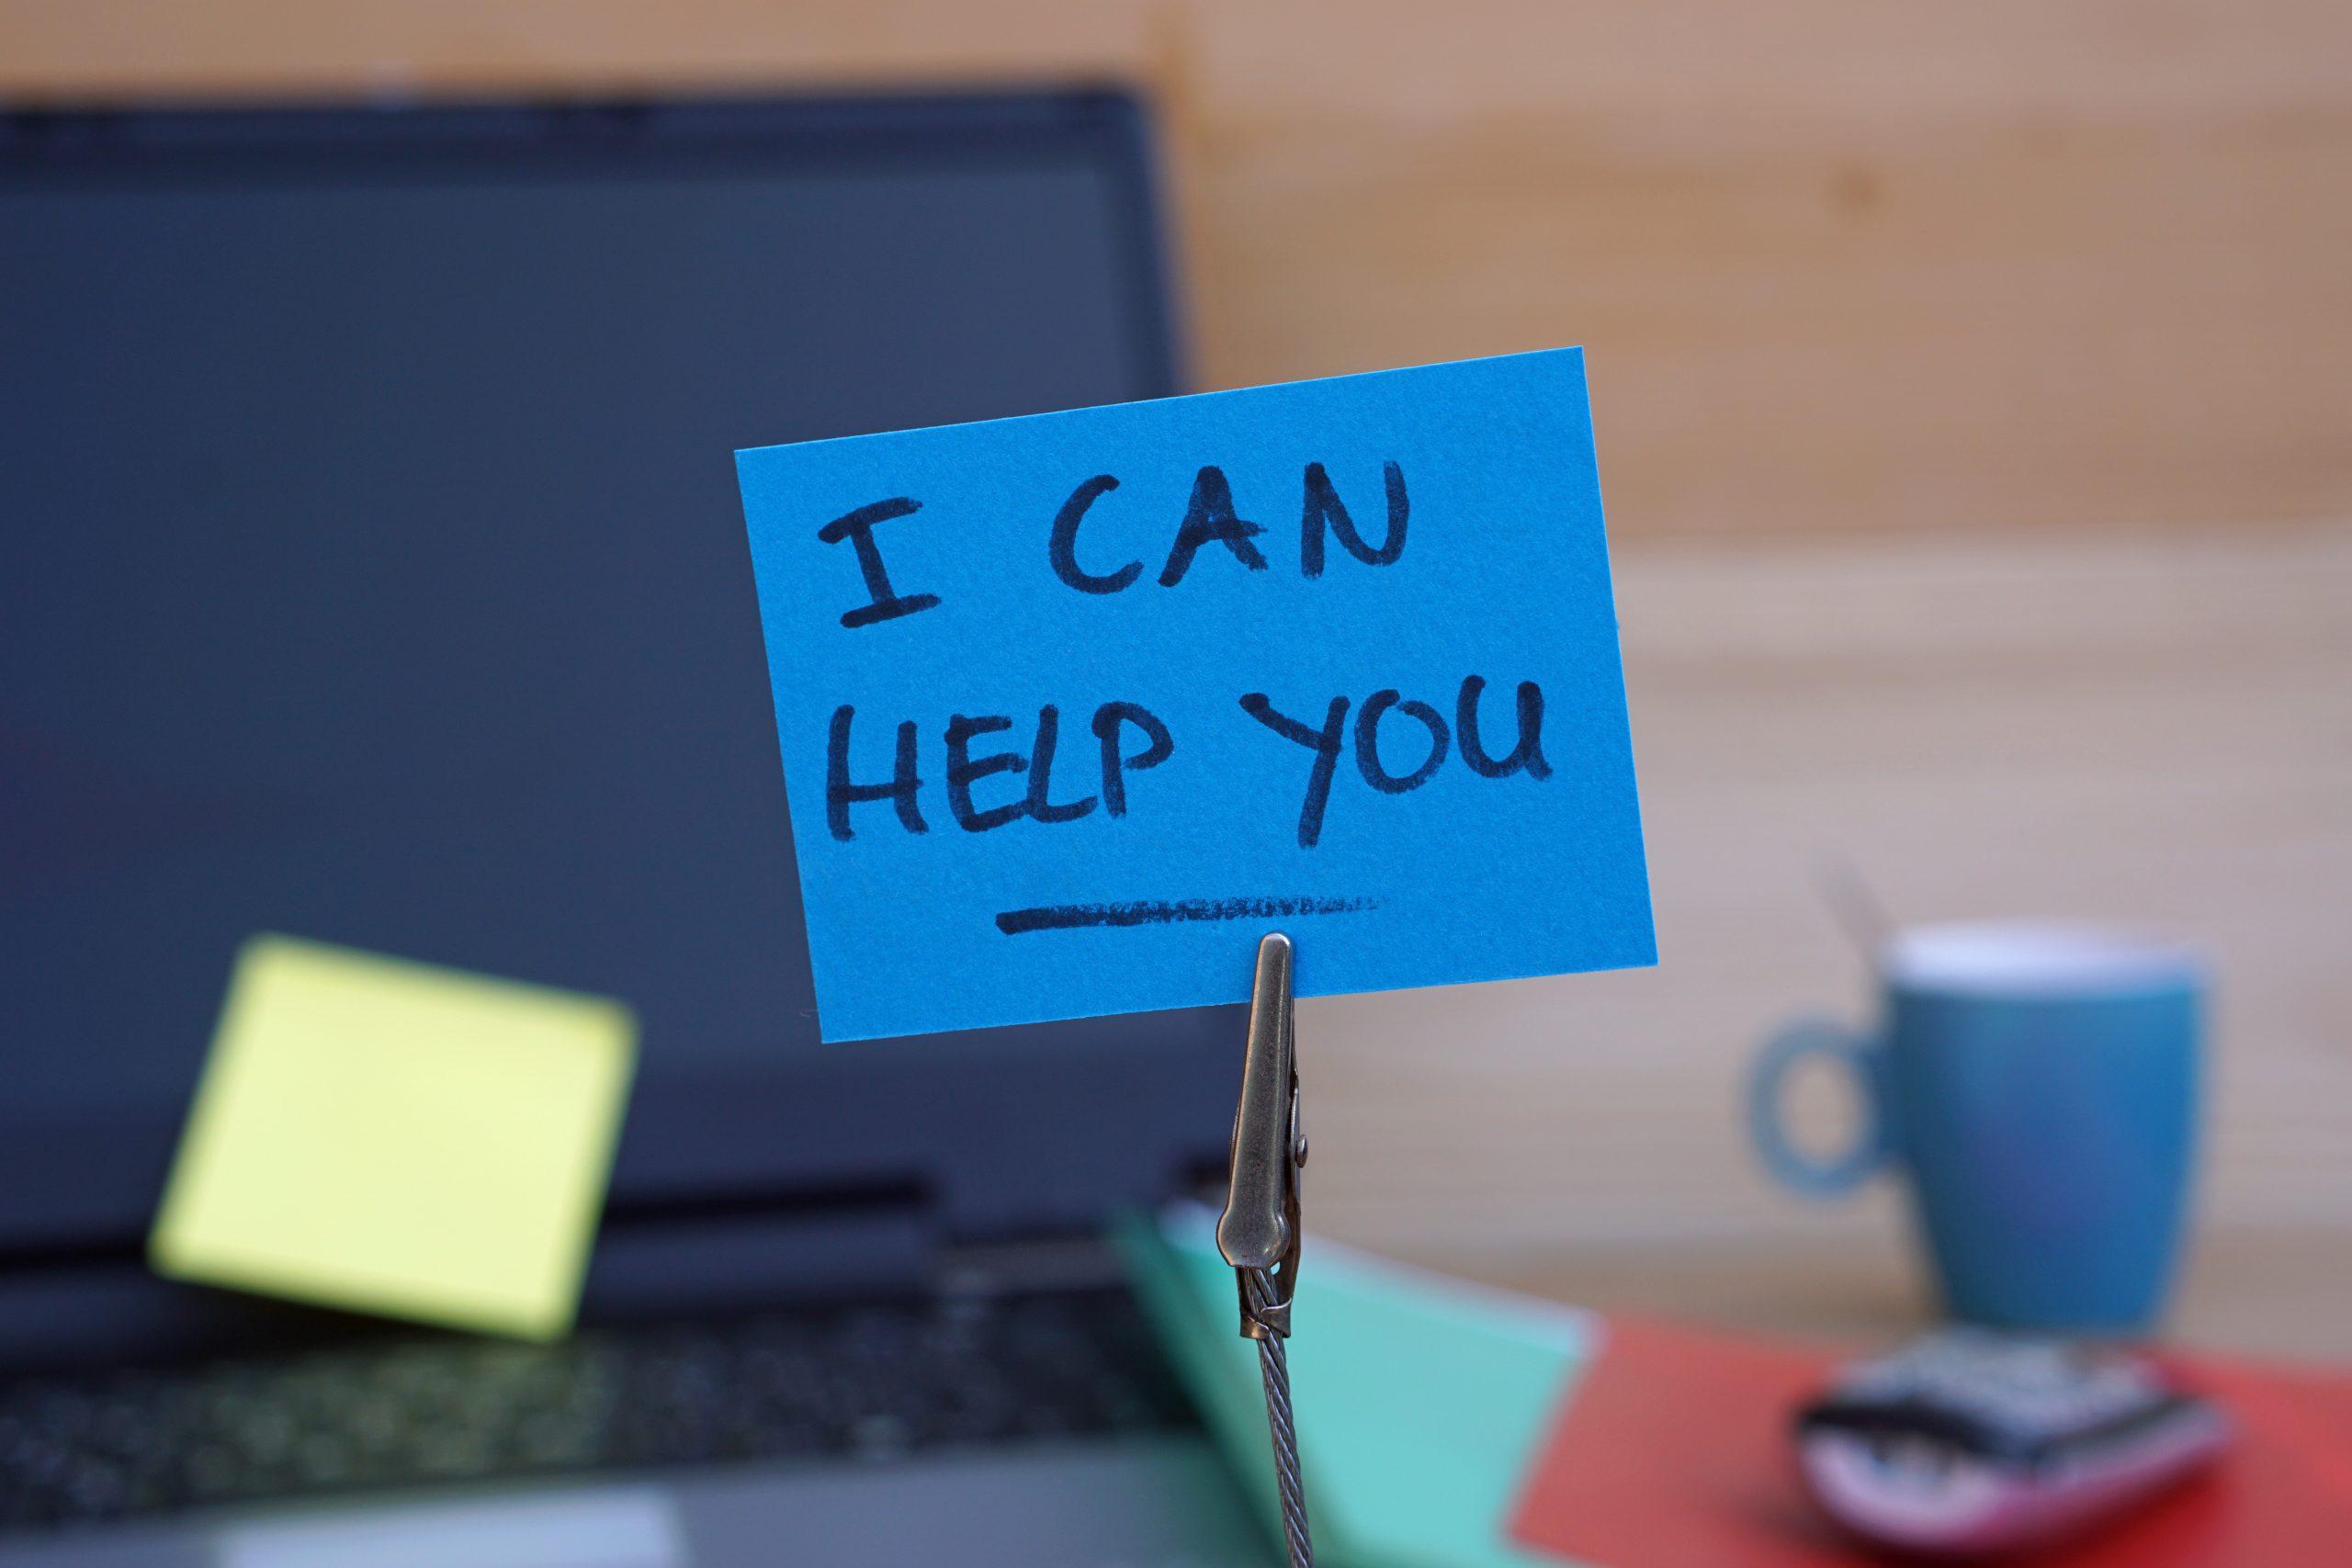 I can help